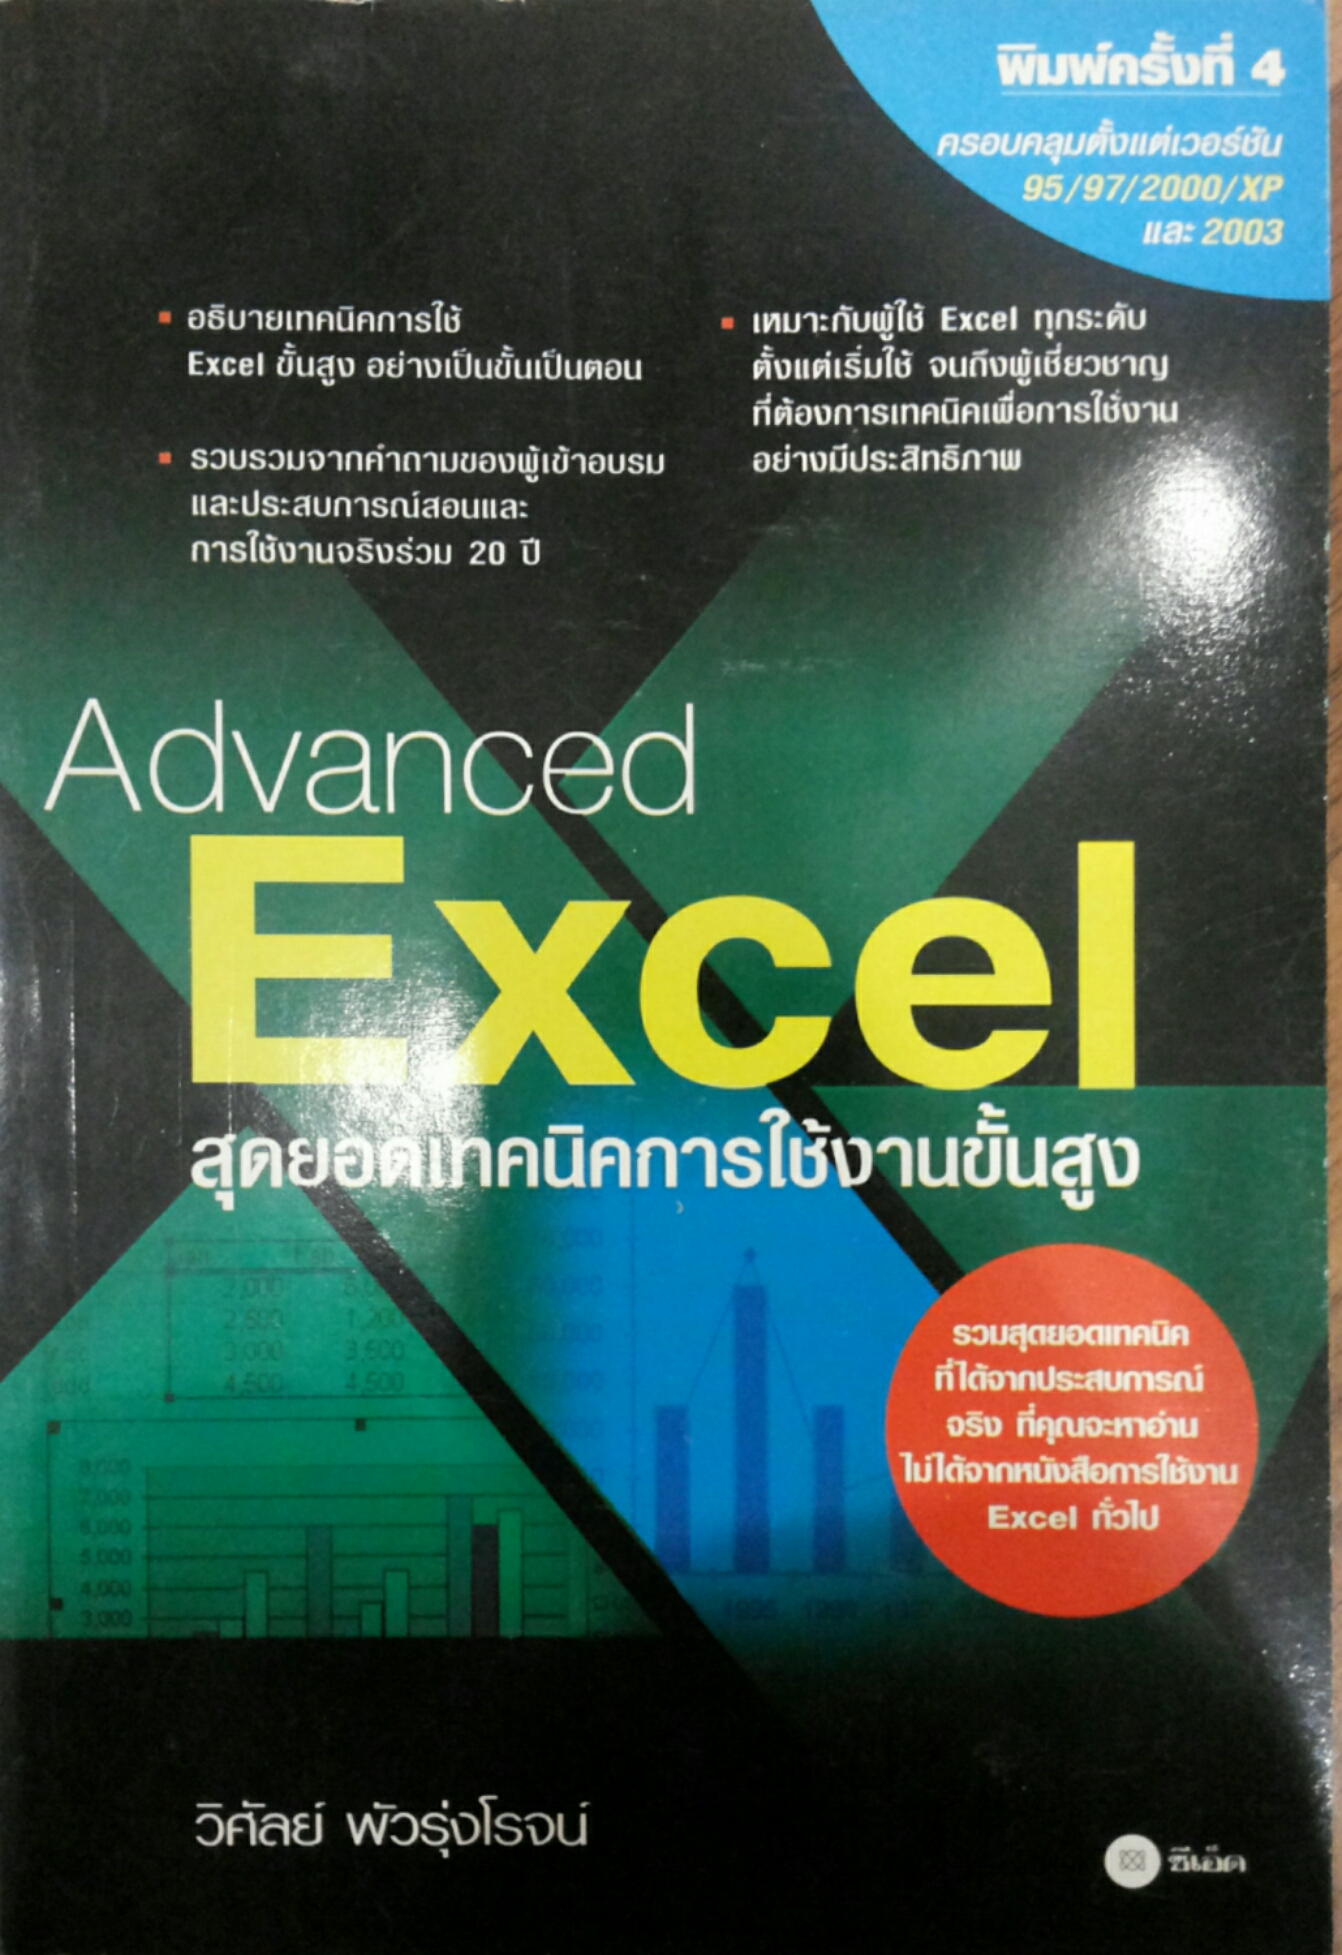 Advanced Excel สุดยอดเทคนิคการใช้งานขั้นสูง